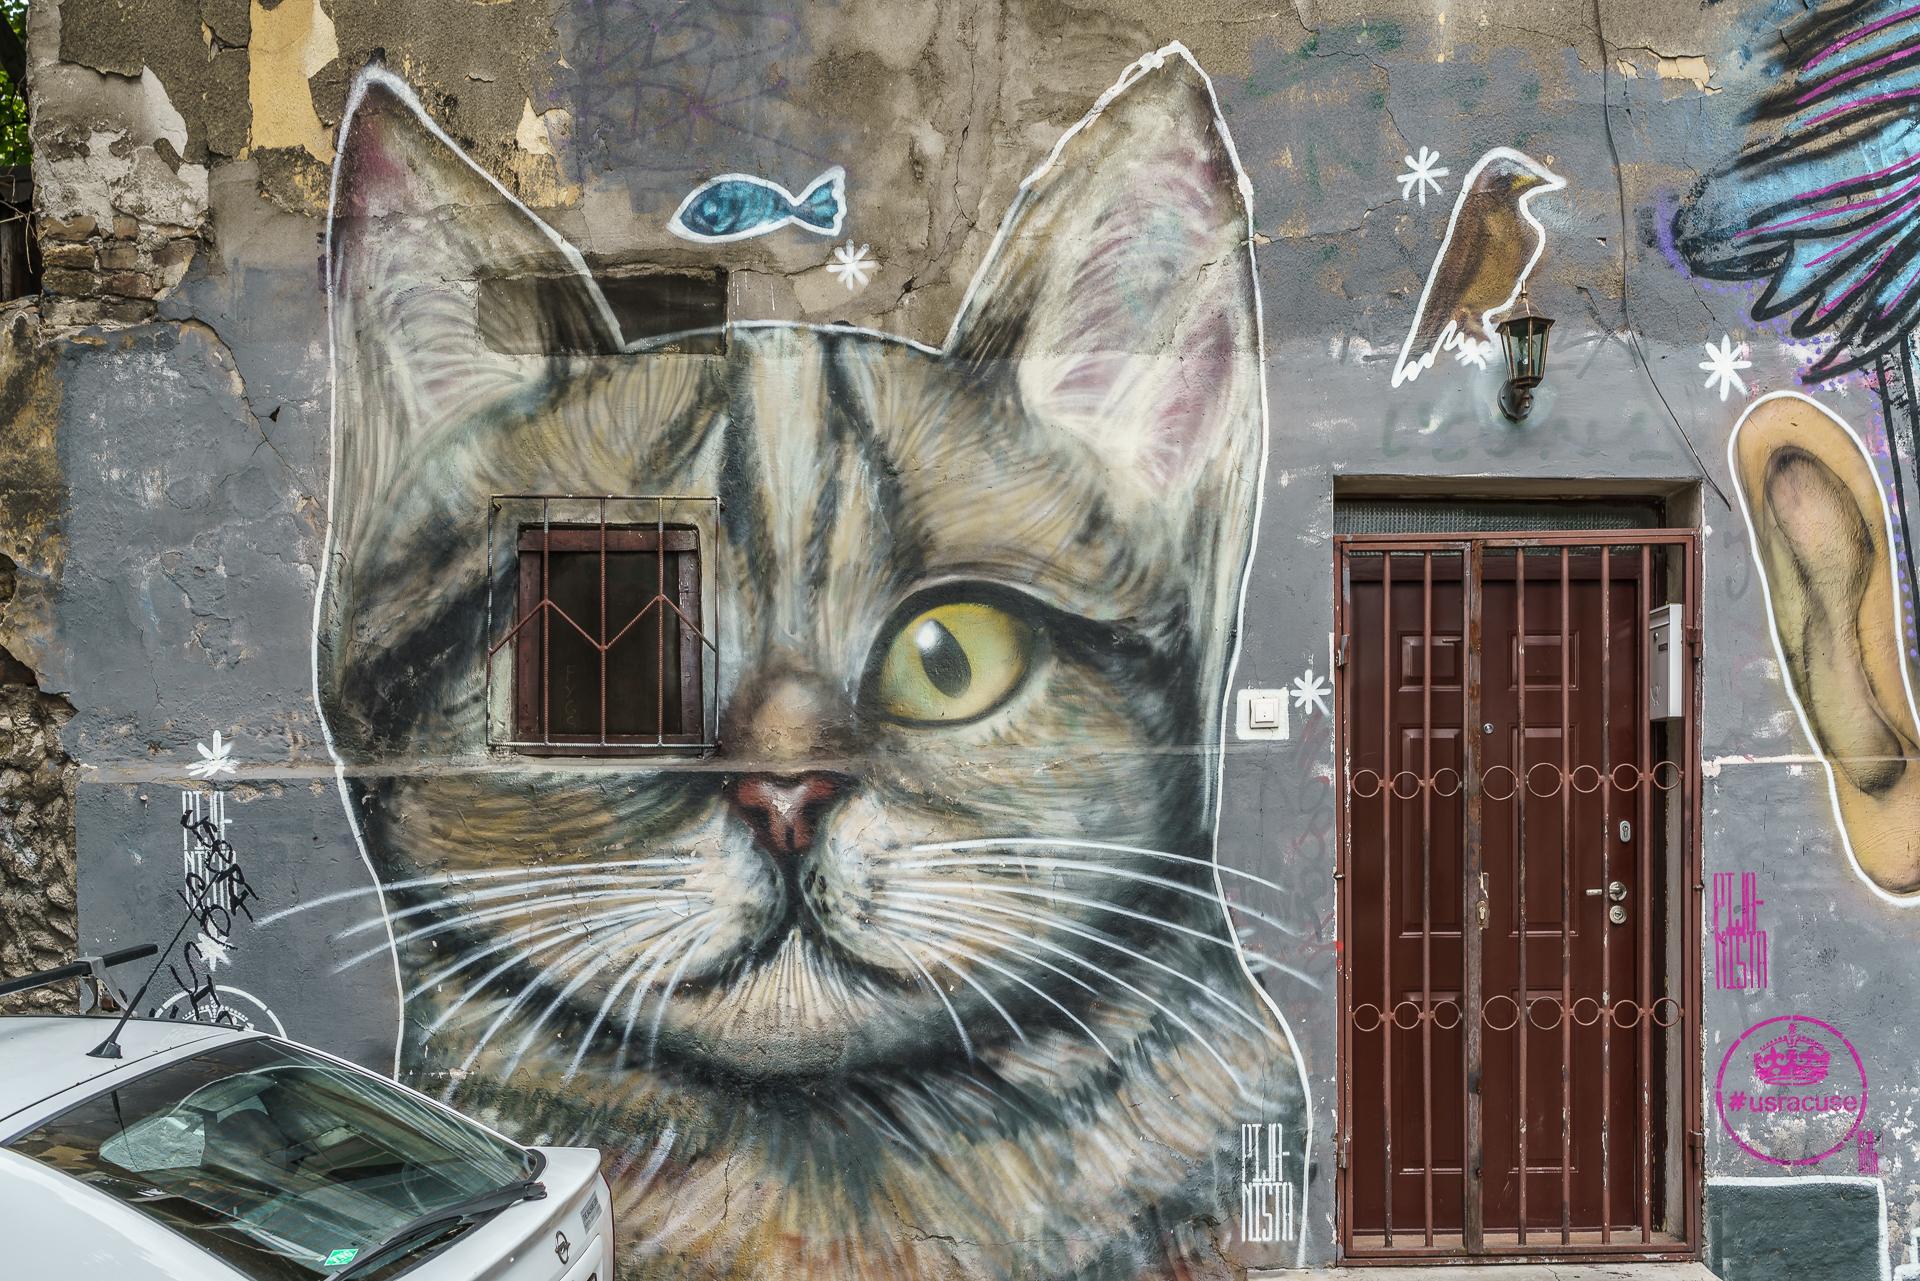 Savamala-Belgrad-Streetart-3